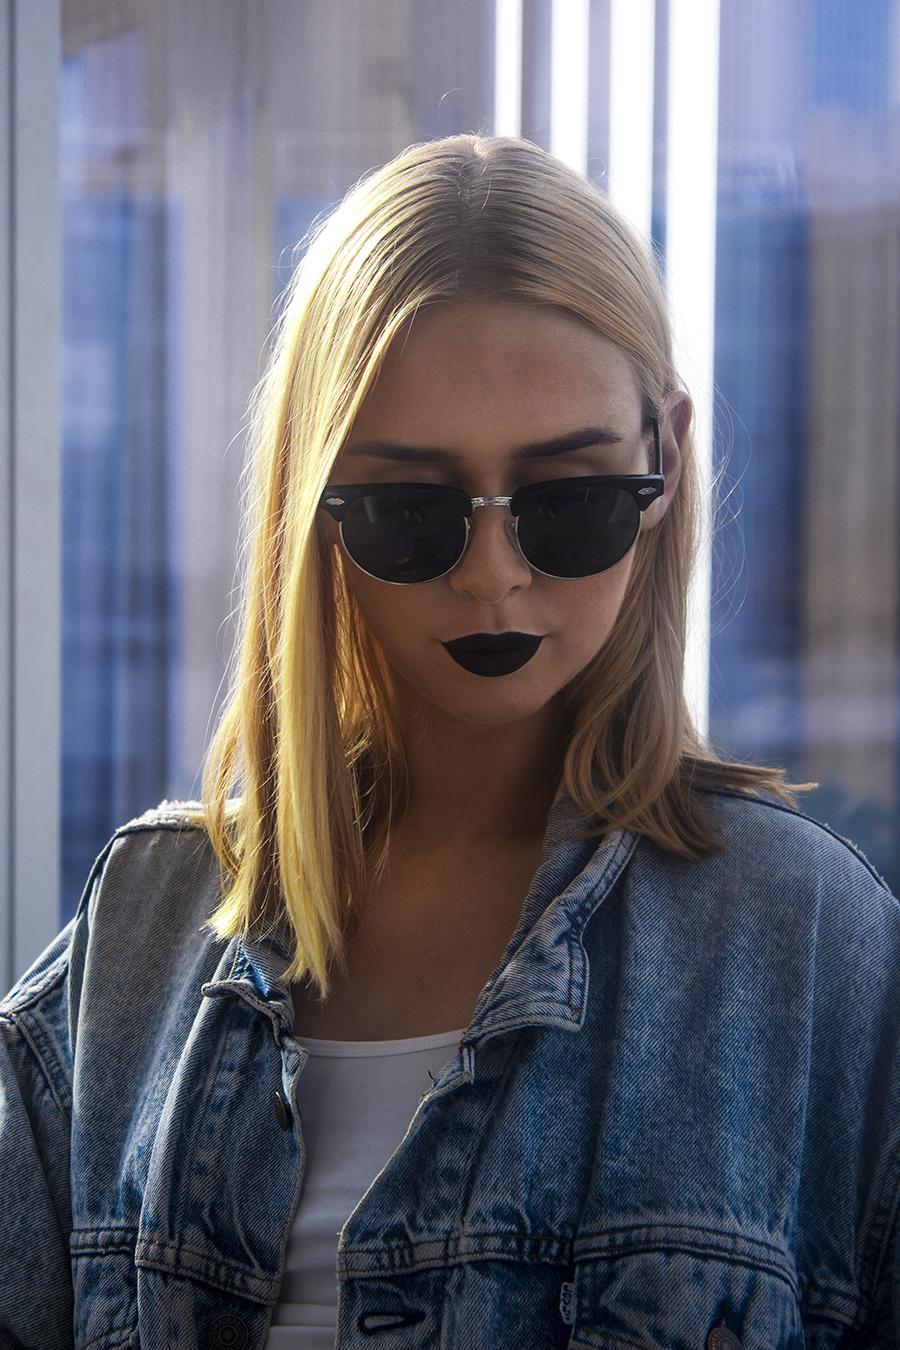 RIA_VAIDYA_photography_fashion_tony_ward_studio_leather_jacket_dark_sunglasses_mood